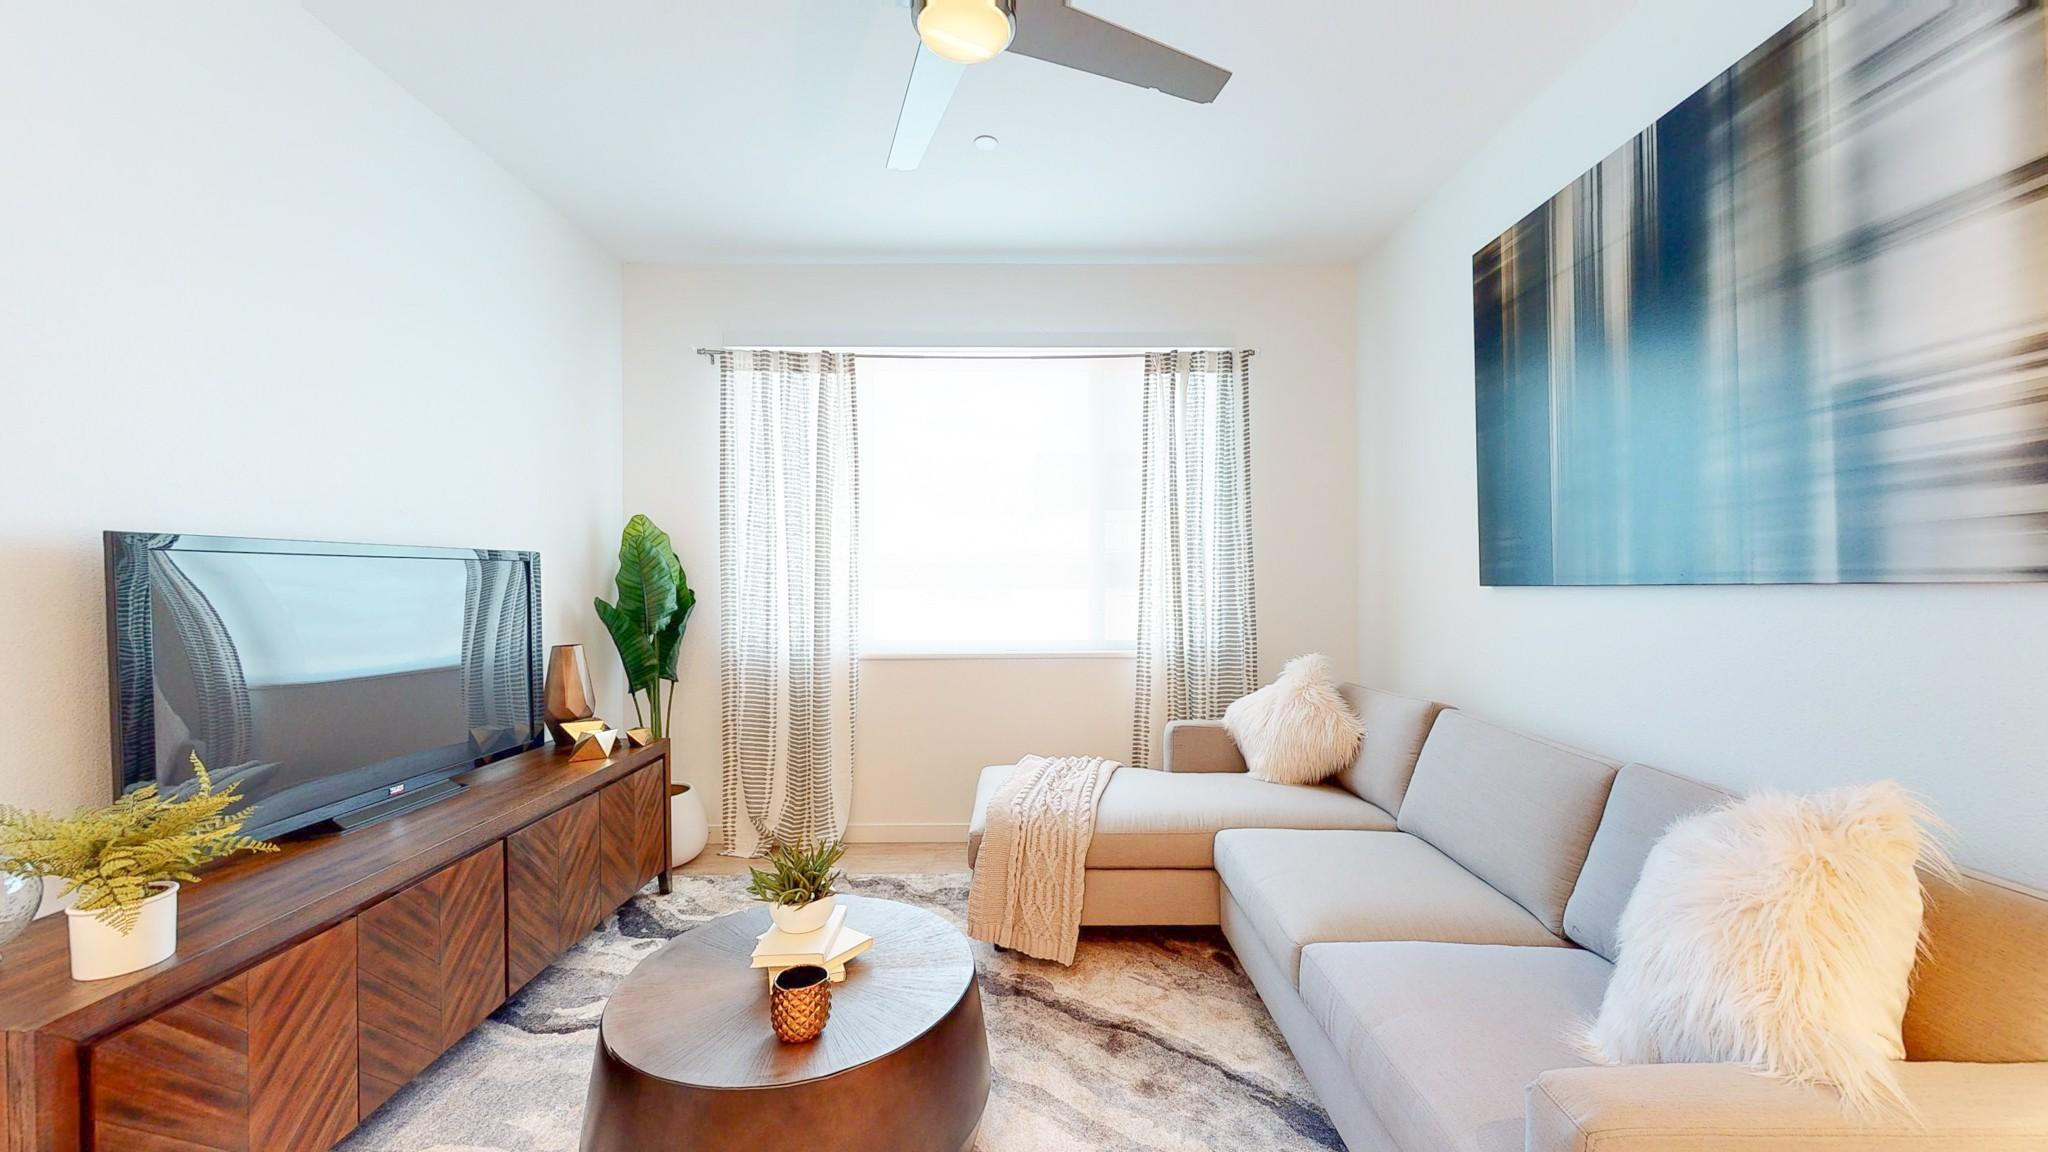 Urbana Chula Vista Apartments for rent